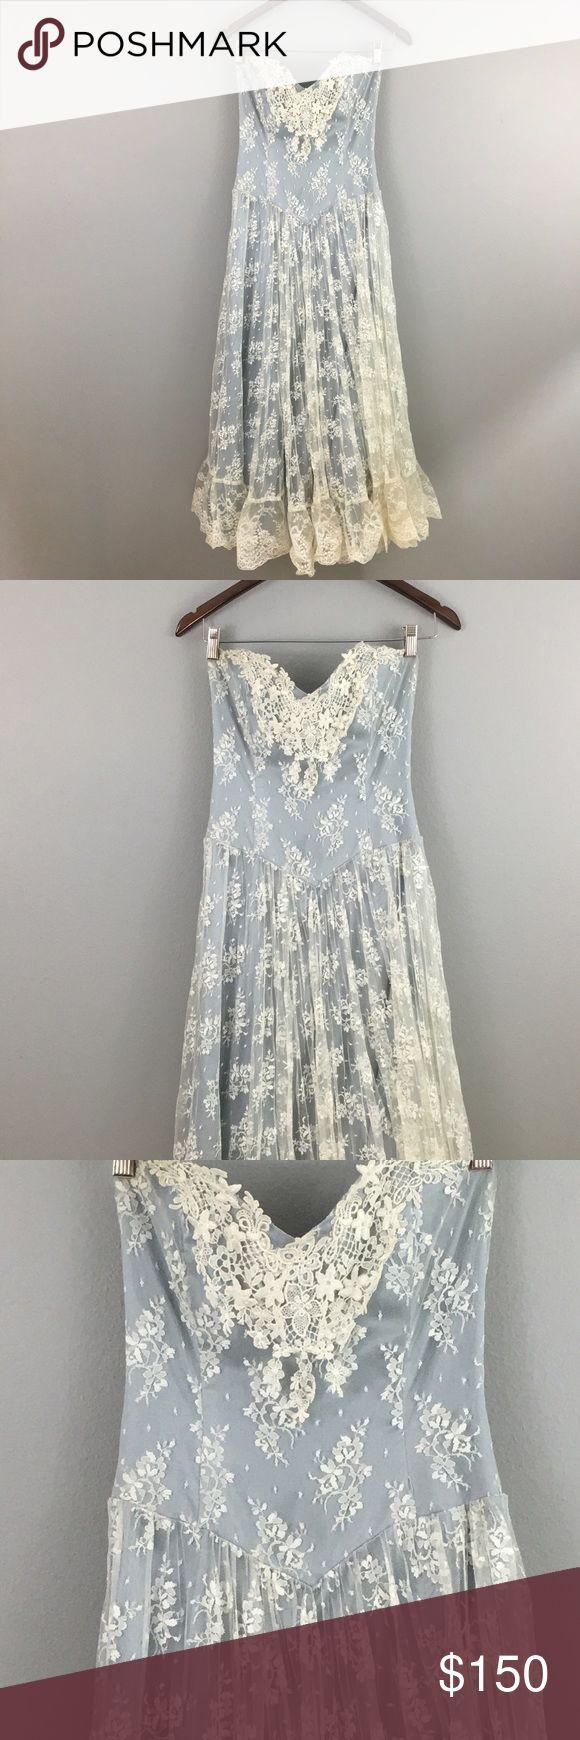 Jessica McClintock Vintage Lace Wedding Dress! Size 8! Romantic Whimsical Jessica McClintock Vintage Ivory Lace Wedding Dress! Jessica McClintock Dresses